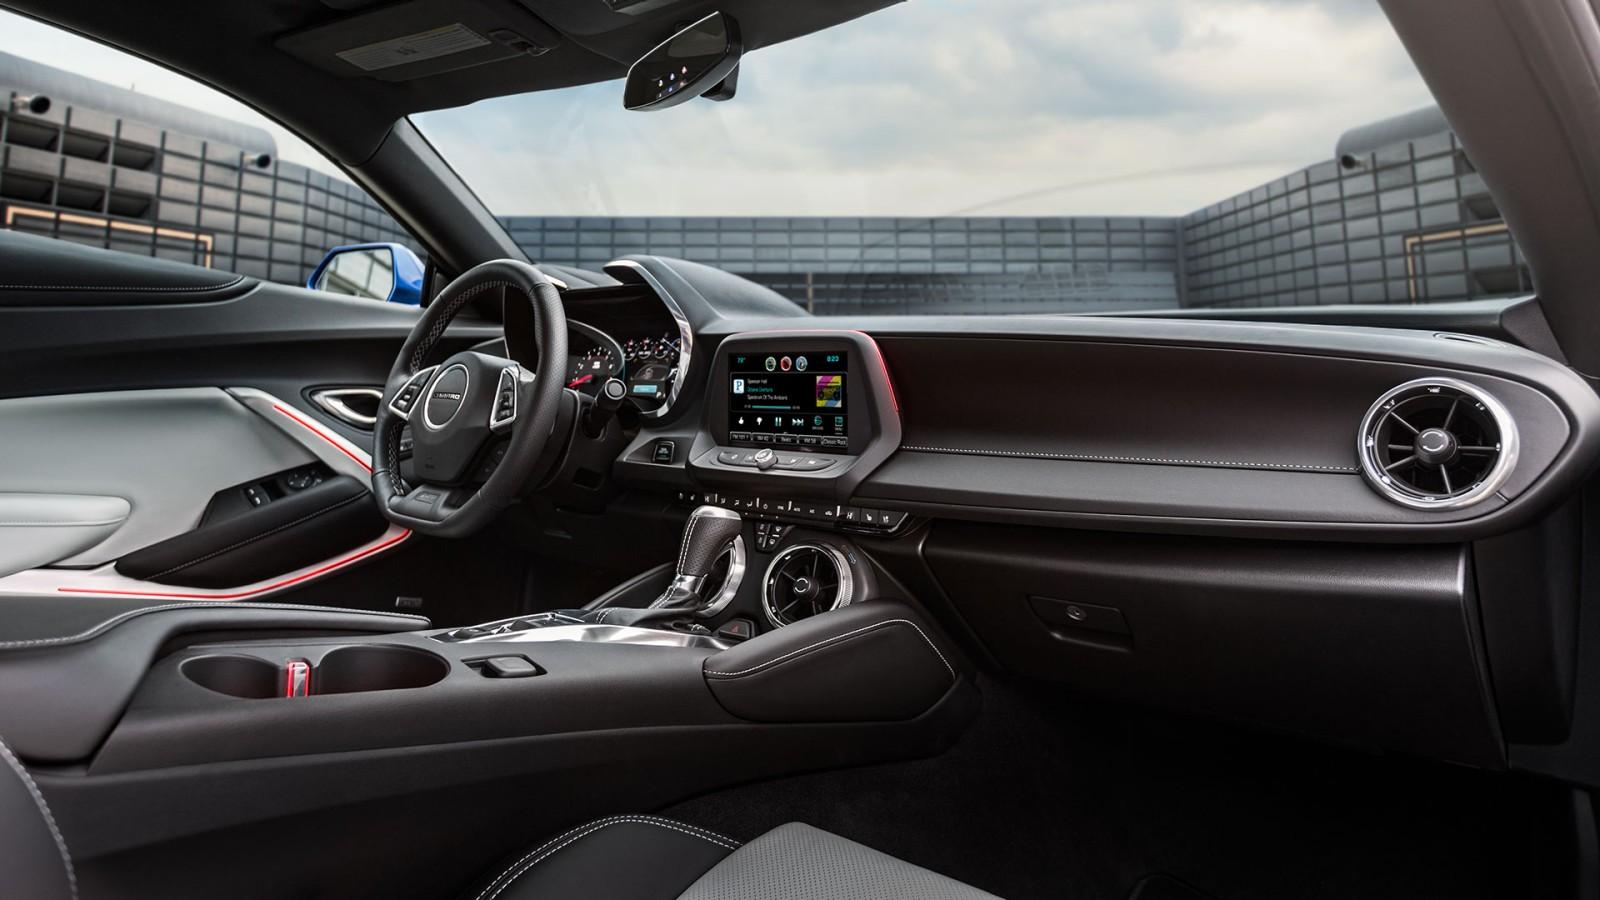 New Chevrolet Camaro Interior image 1